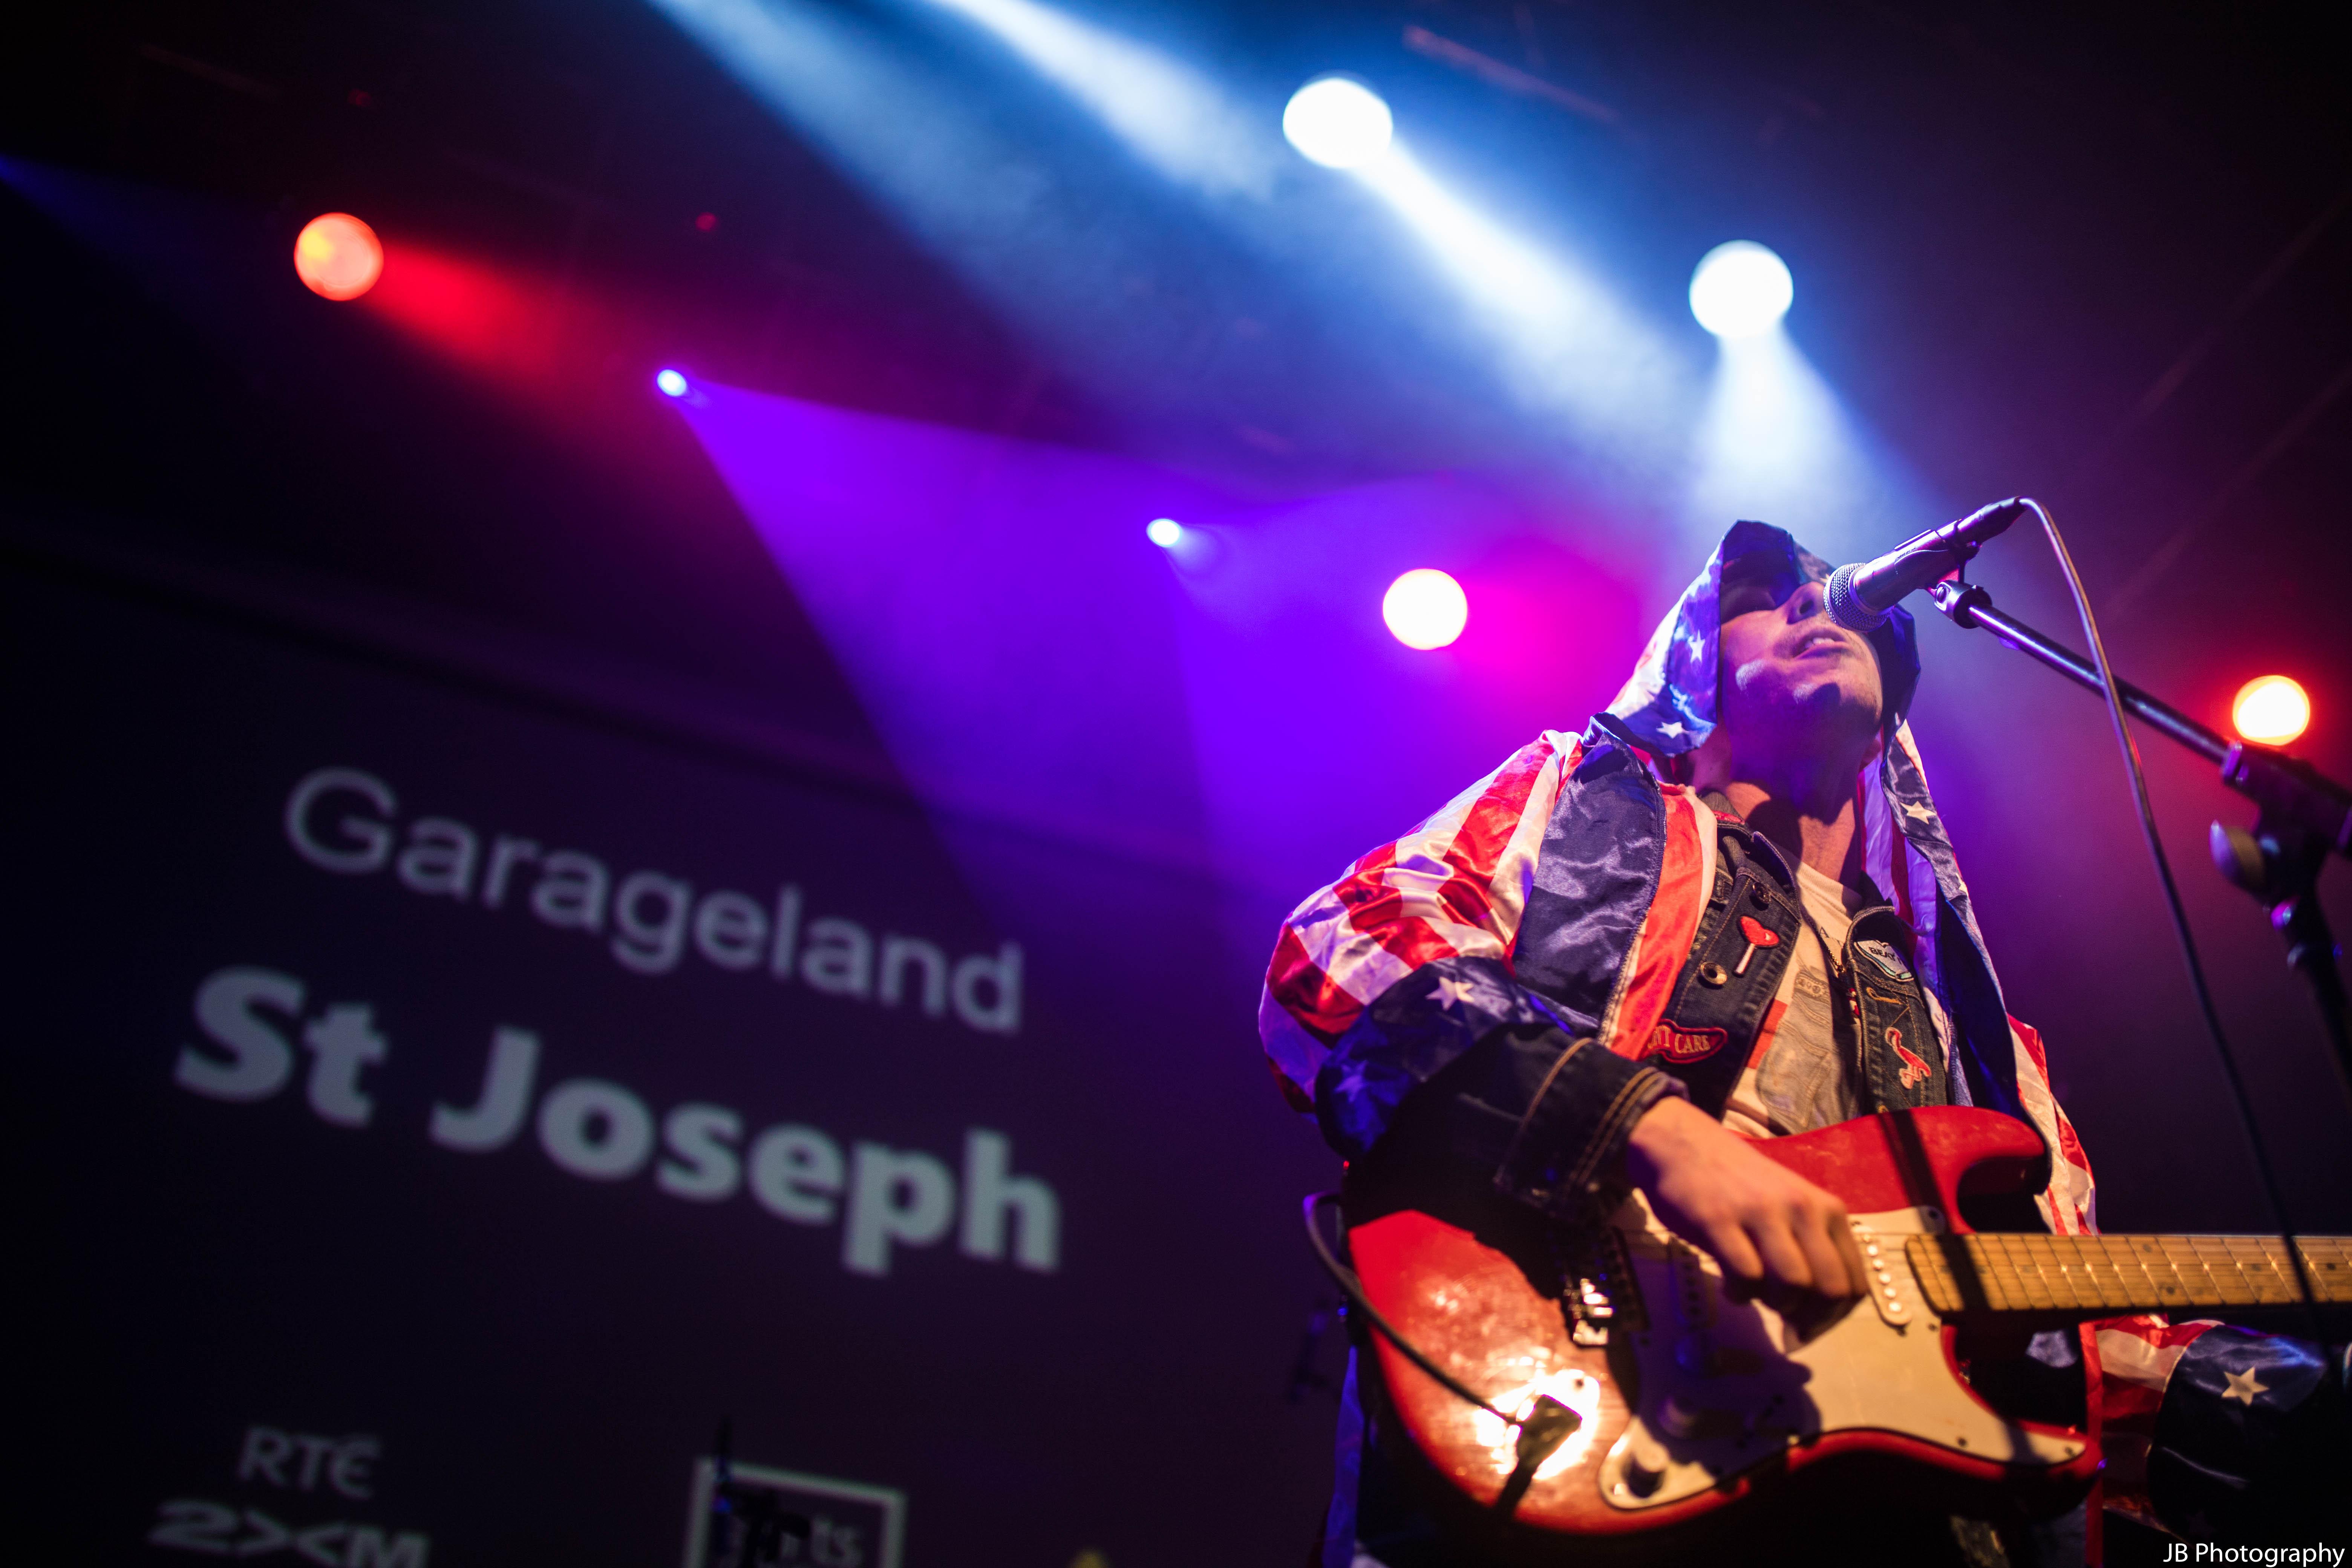 Picture of St. Joseph - Garageland TV finale gig